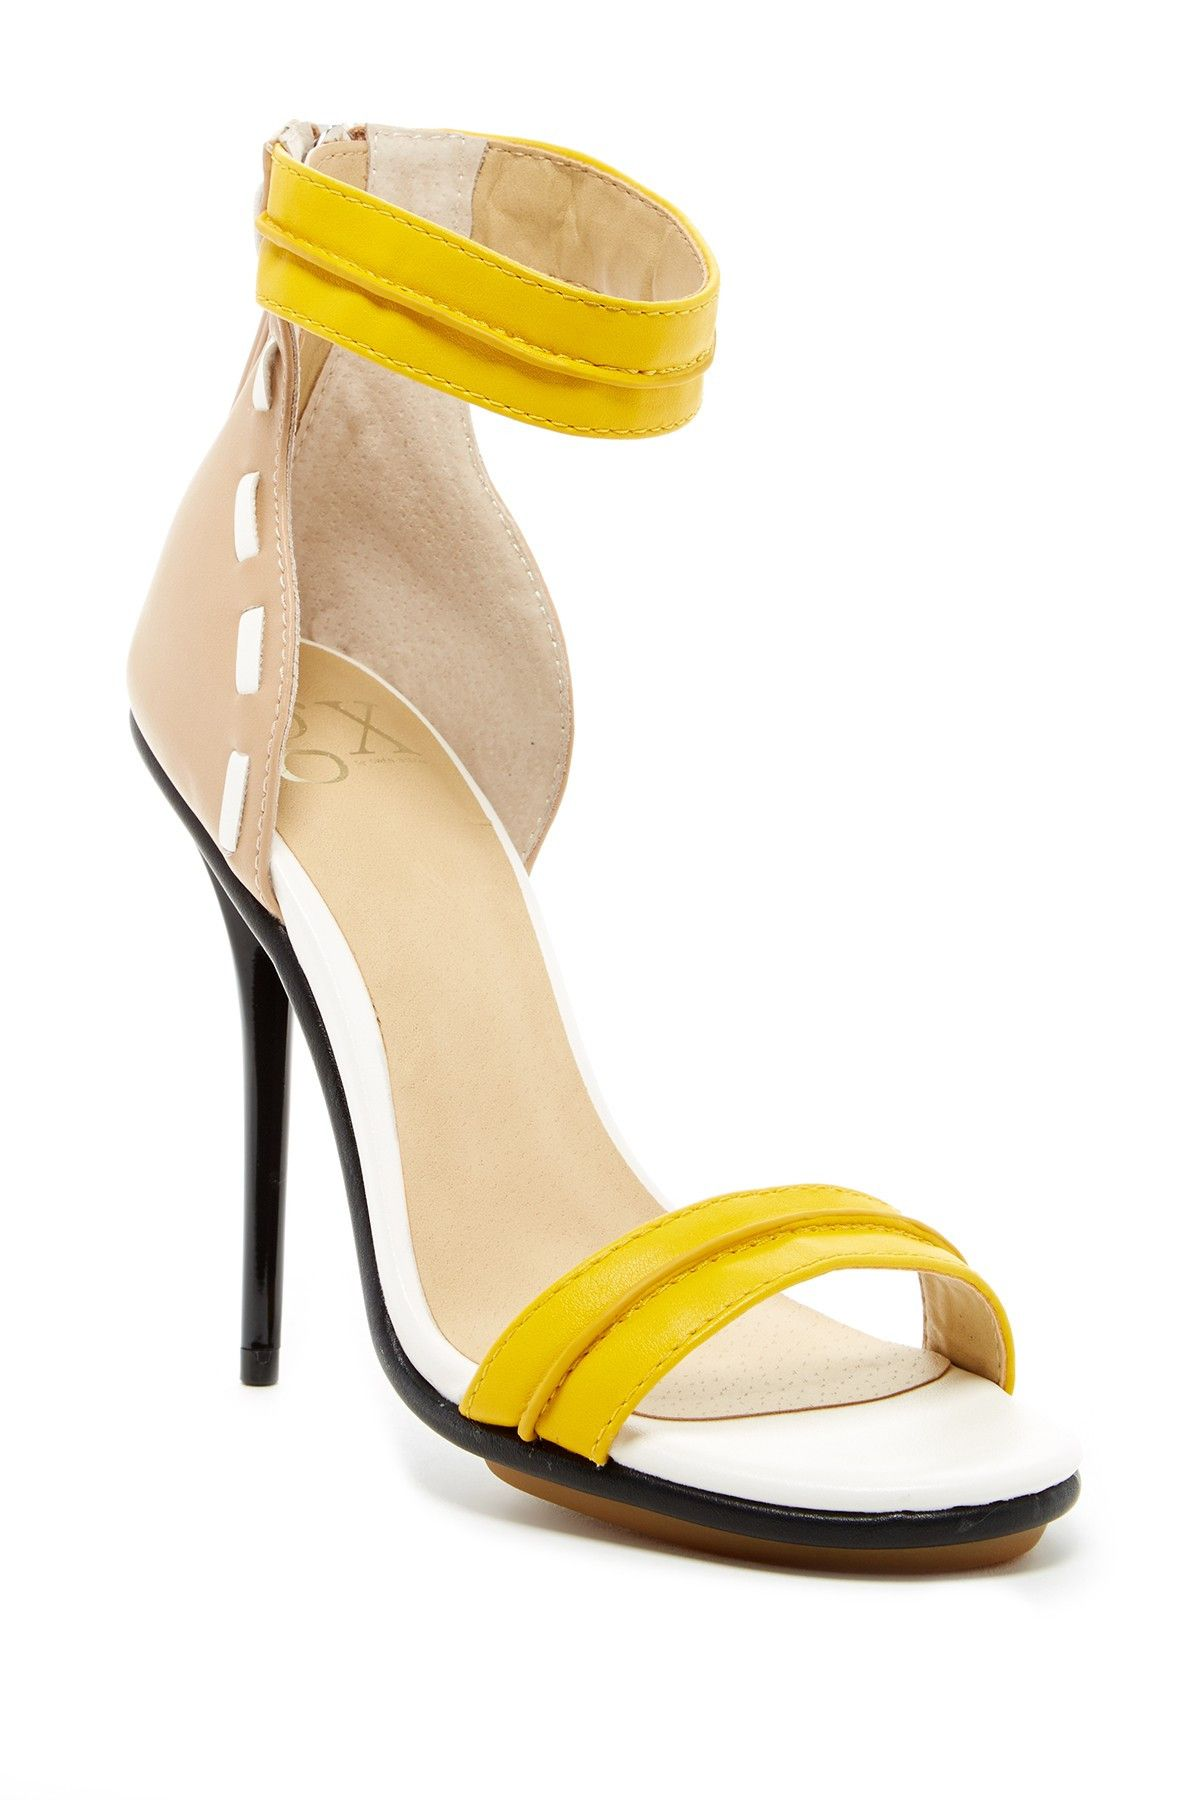 GX by Gwen Stefani Armin Heeled Sandal $49.97